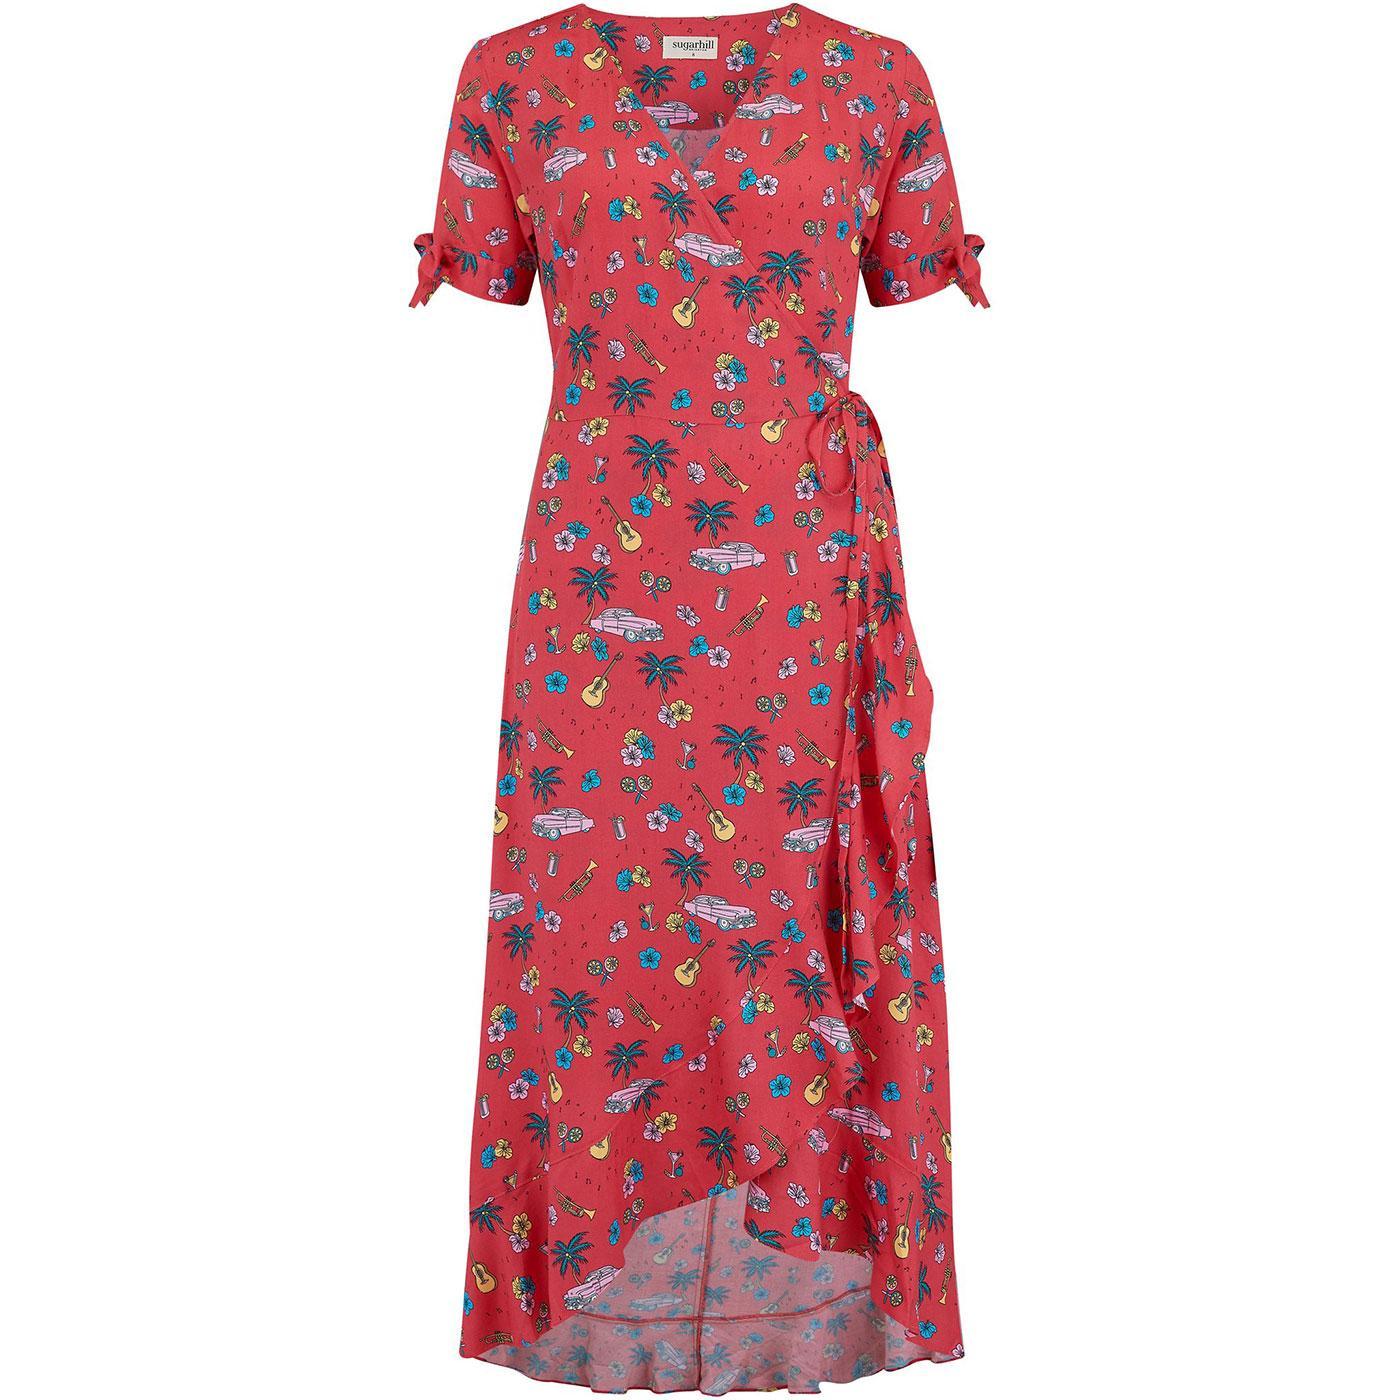 Jackie SUGARHILL BRIGHTON 50s Havana Wrap Dress